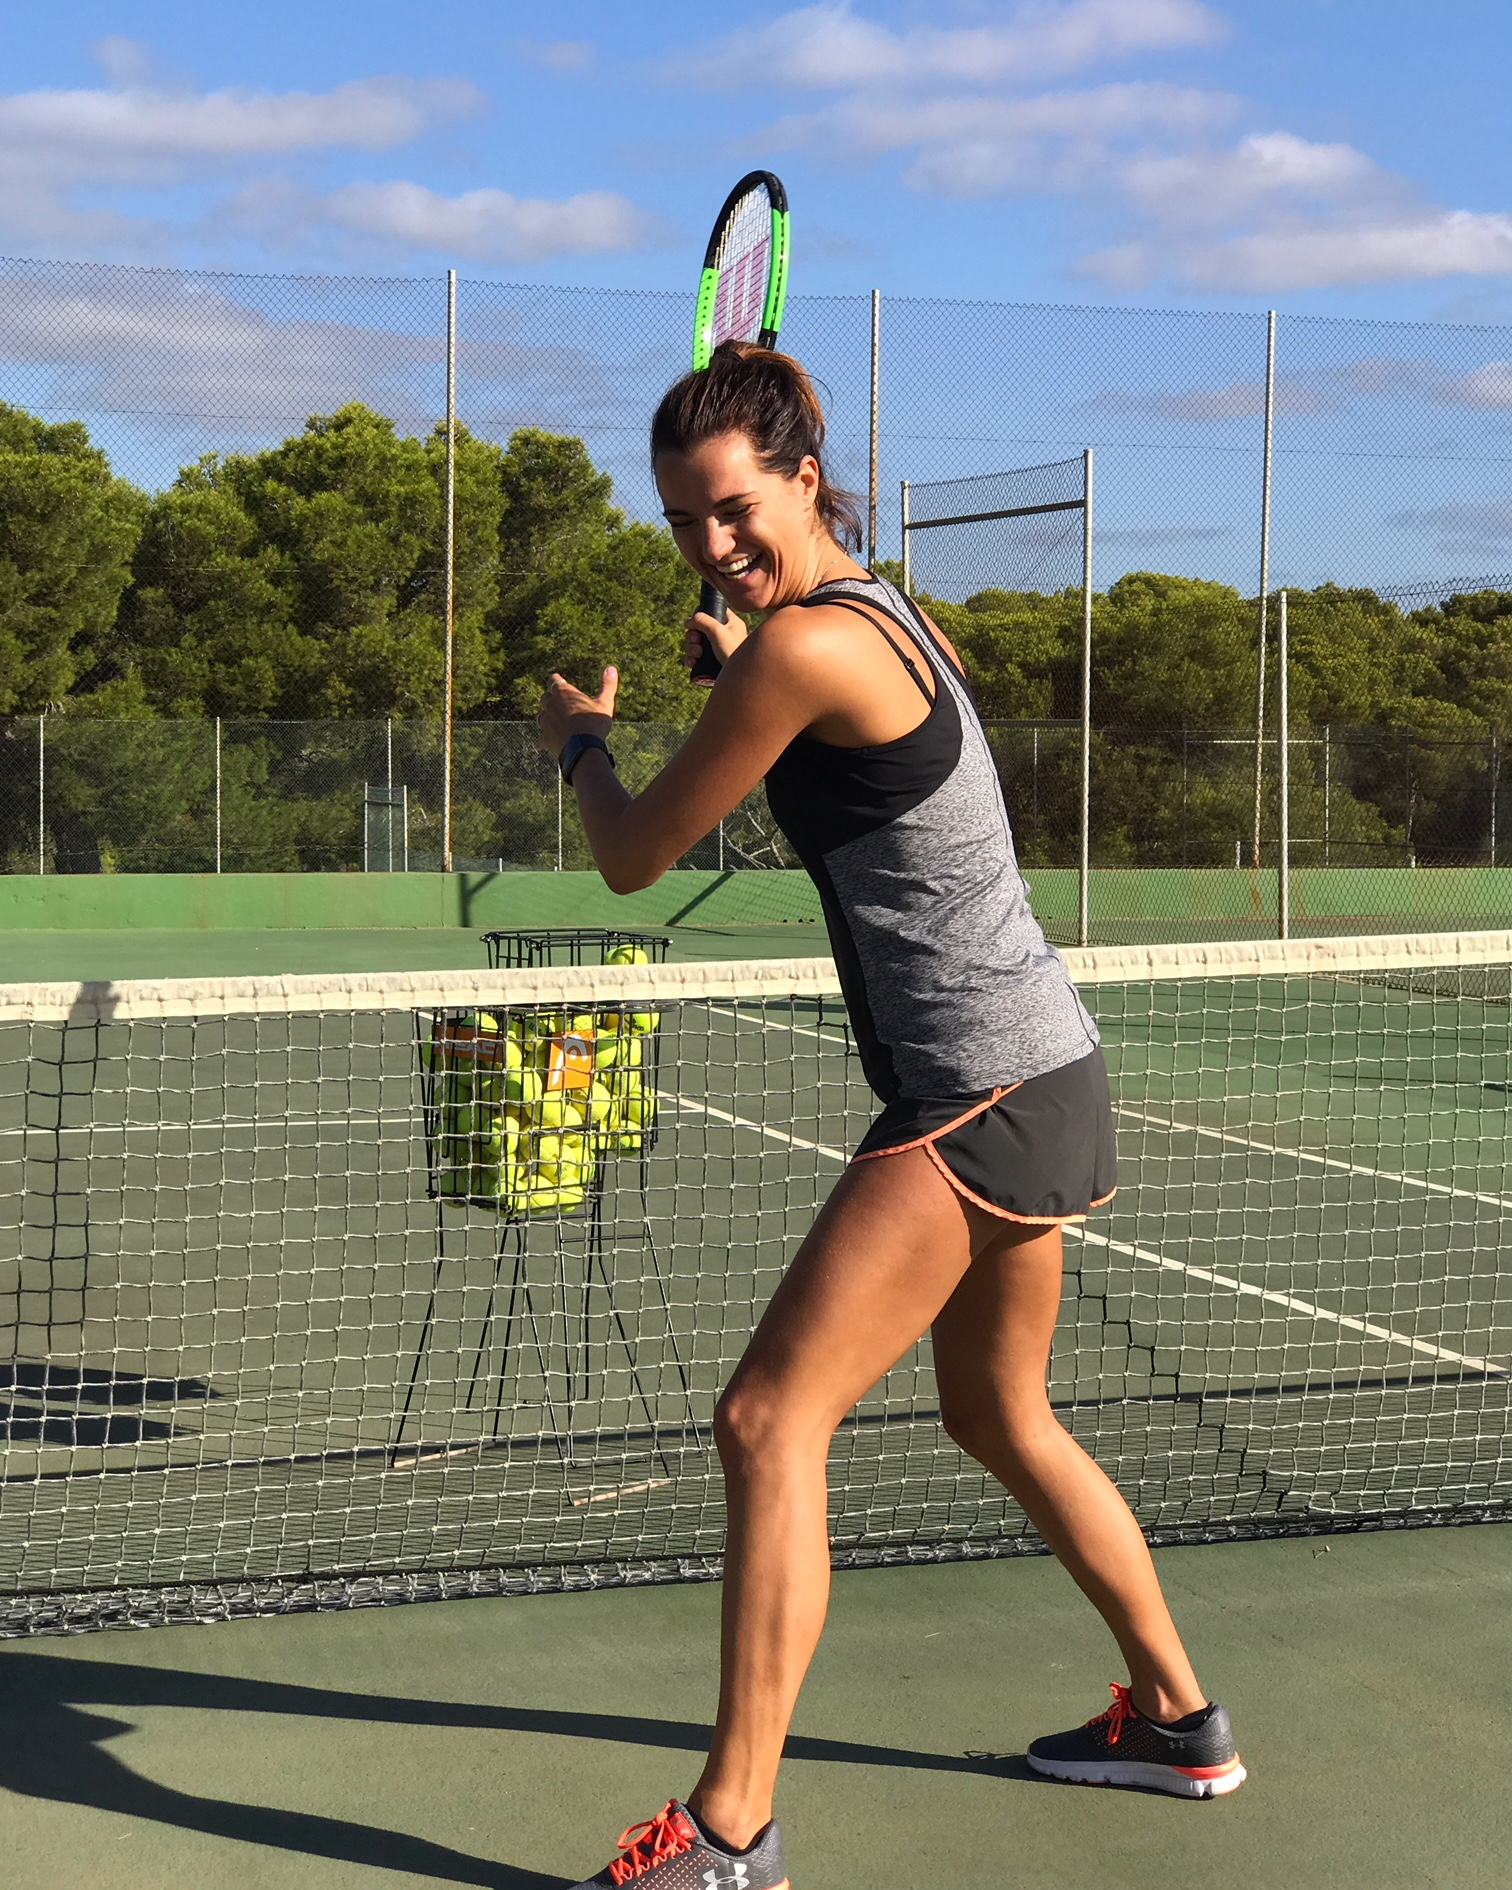 fitbit ionic, tennis, daisy